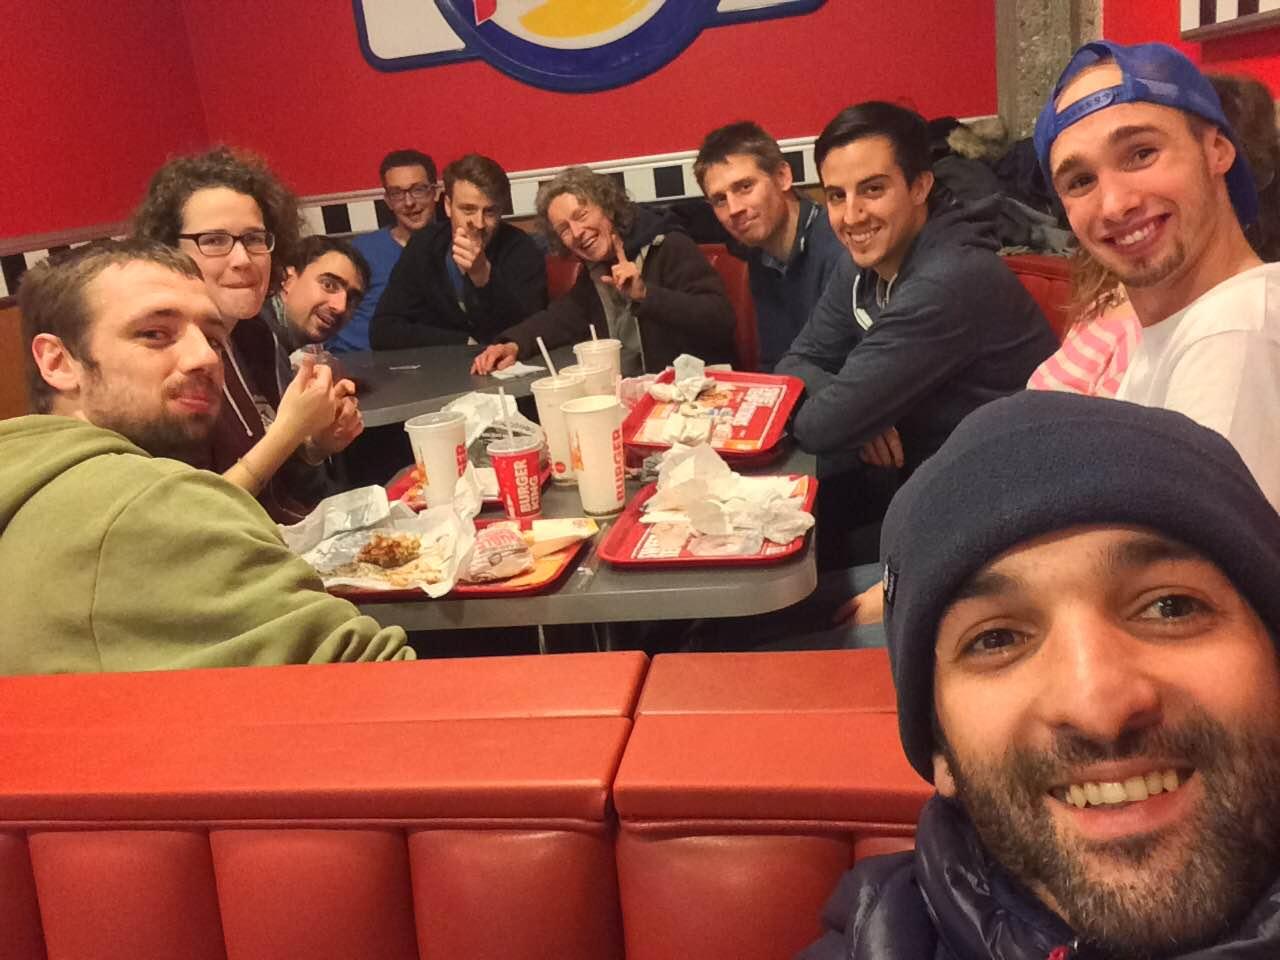 The team enjoying a well-deserved Burger King